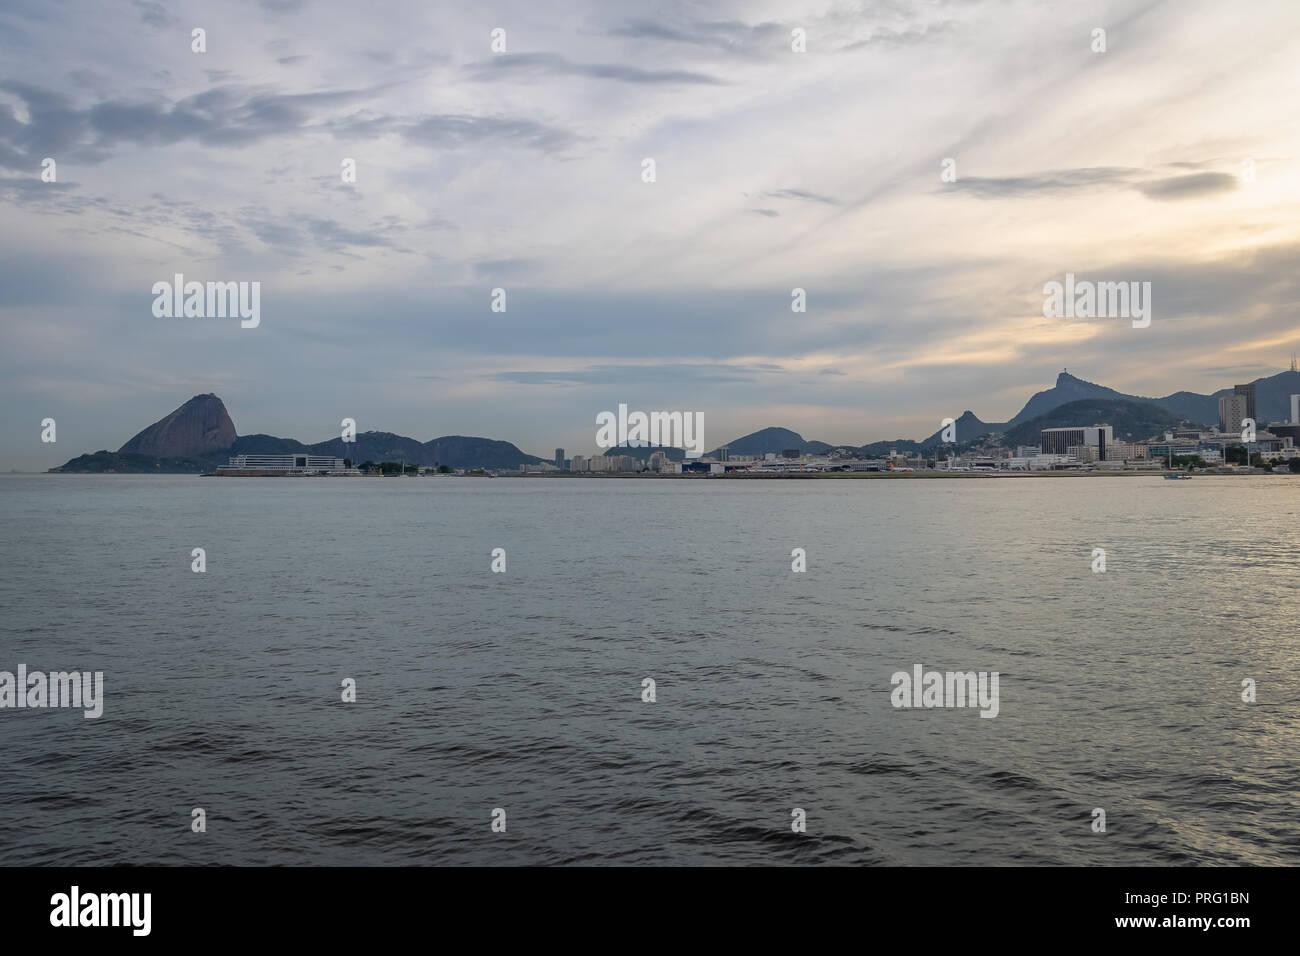 Rio de Janeiro skyline view from Guanabara bay with Sugar Loaf and Corcovado Mountains - Rio de Janeiro, Brazil Stock Photo